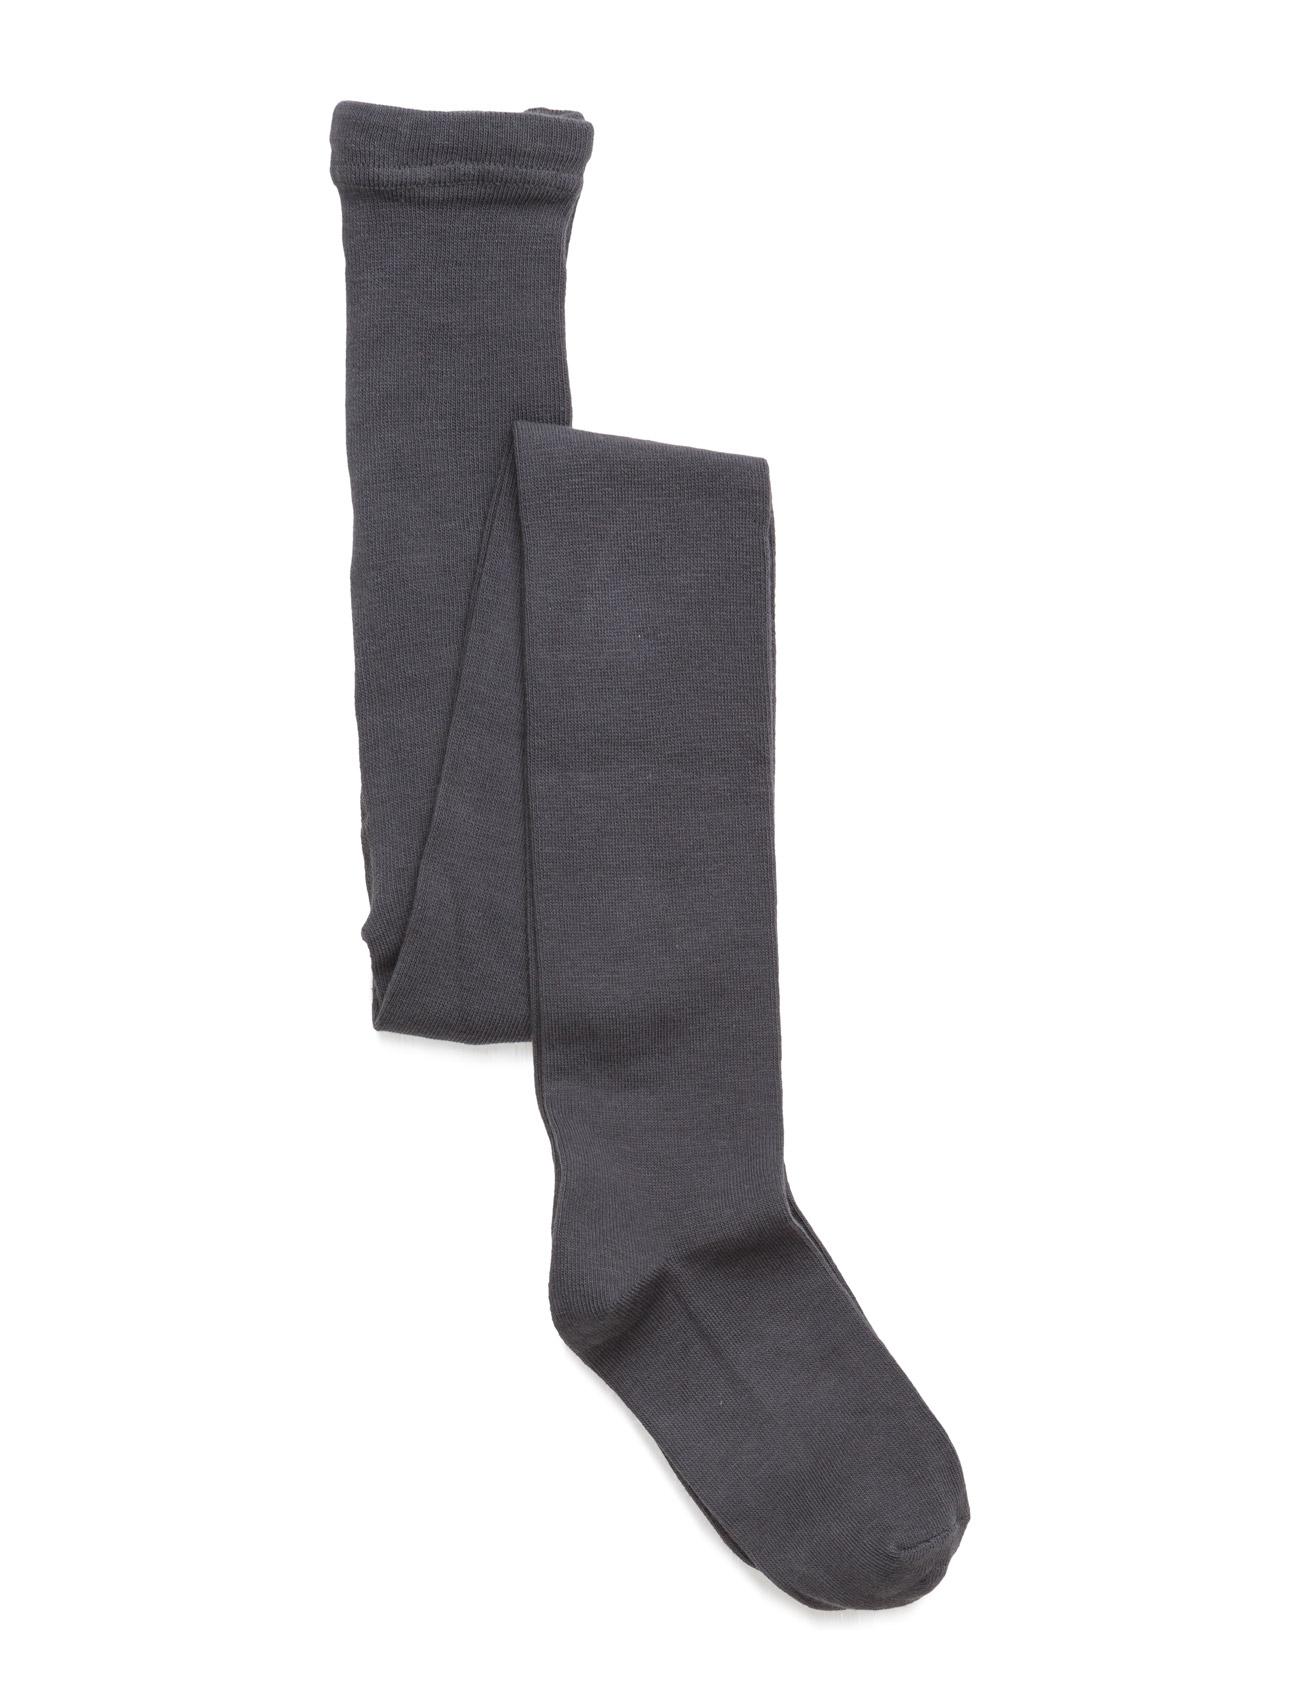 Image of Tight, Plain Colour Girls Socks & Tights Tights Grå MELTON (2382480785)